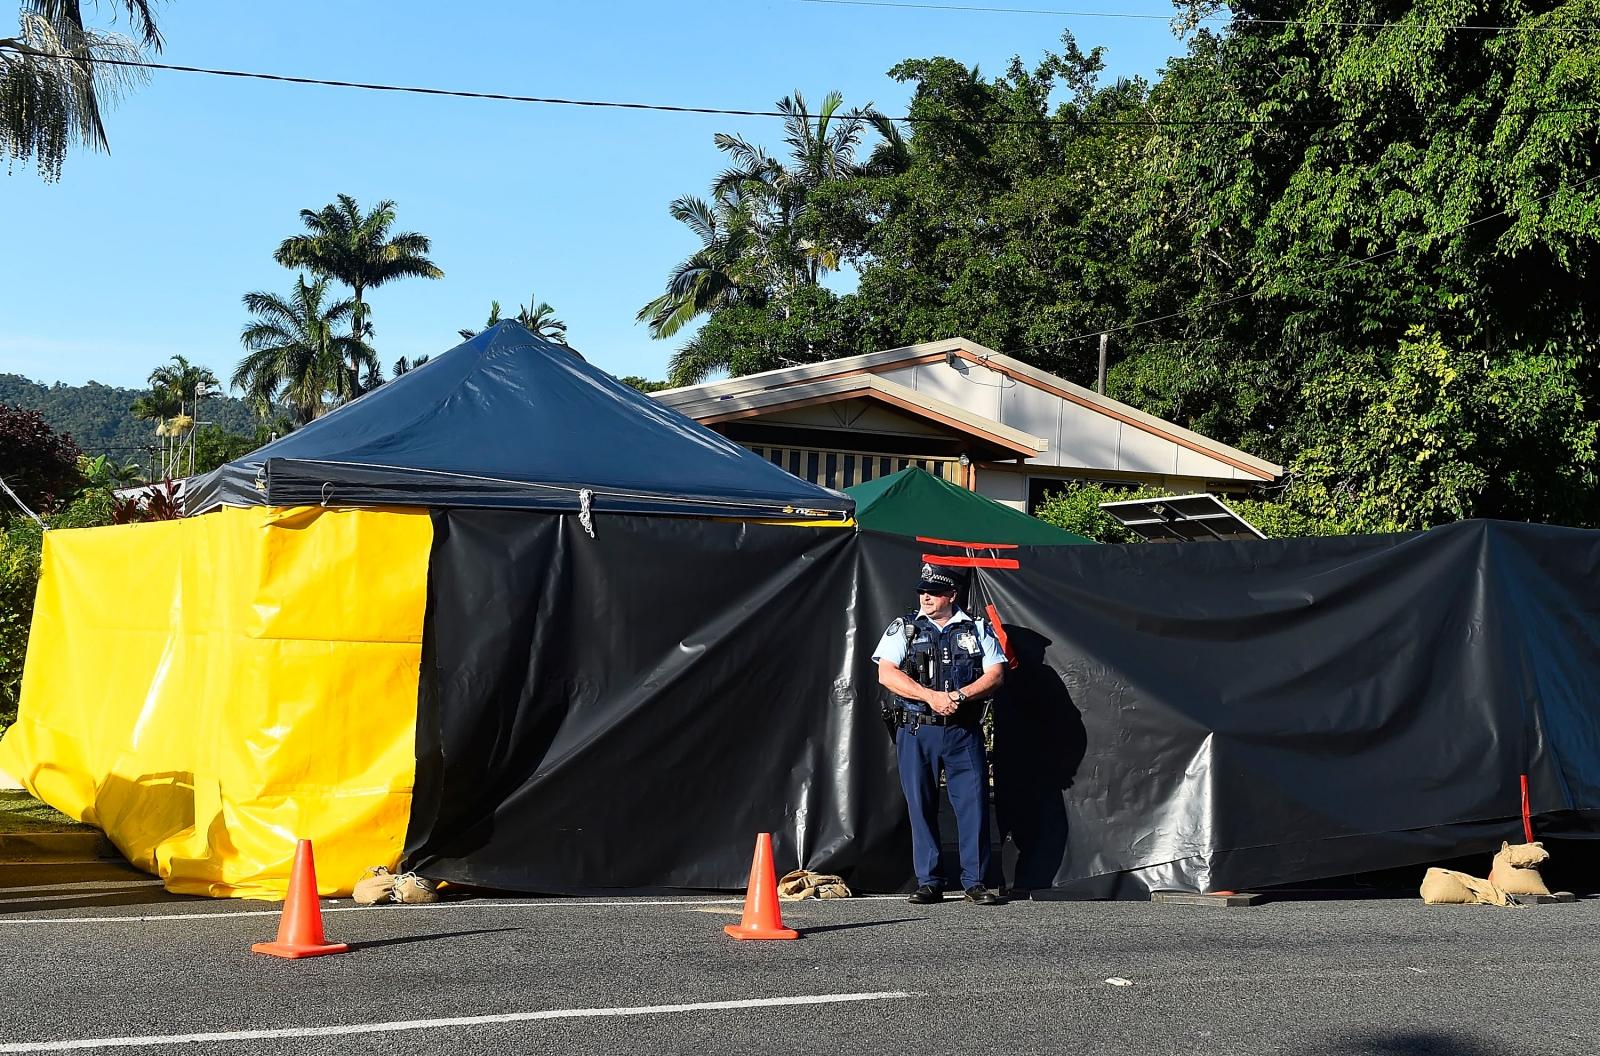 Cairns Stabbing 8 Children killed